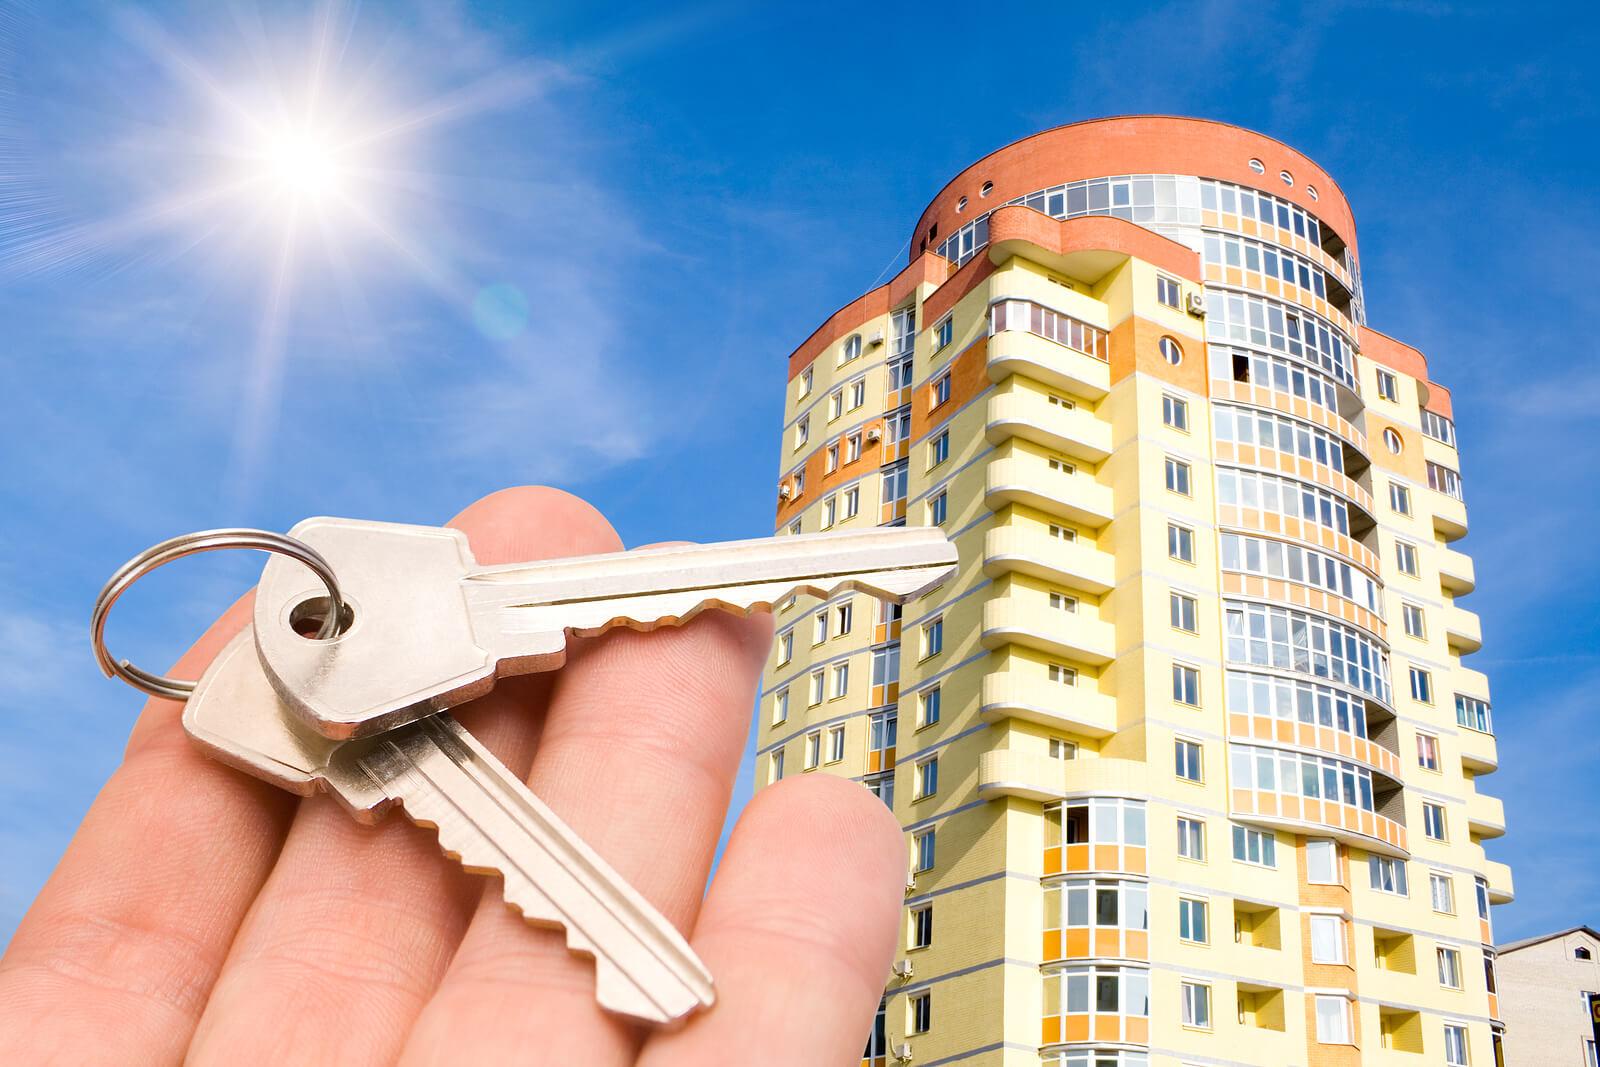 Оформление собственности на квартиру в новостройке при ипотеке